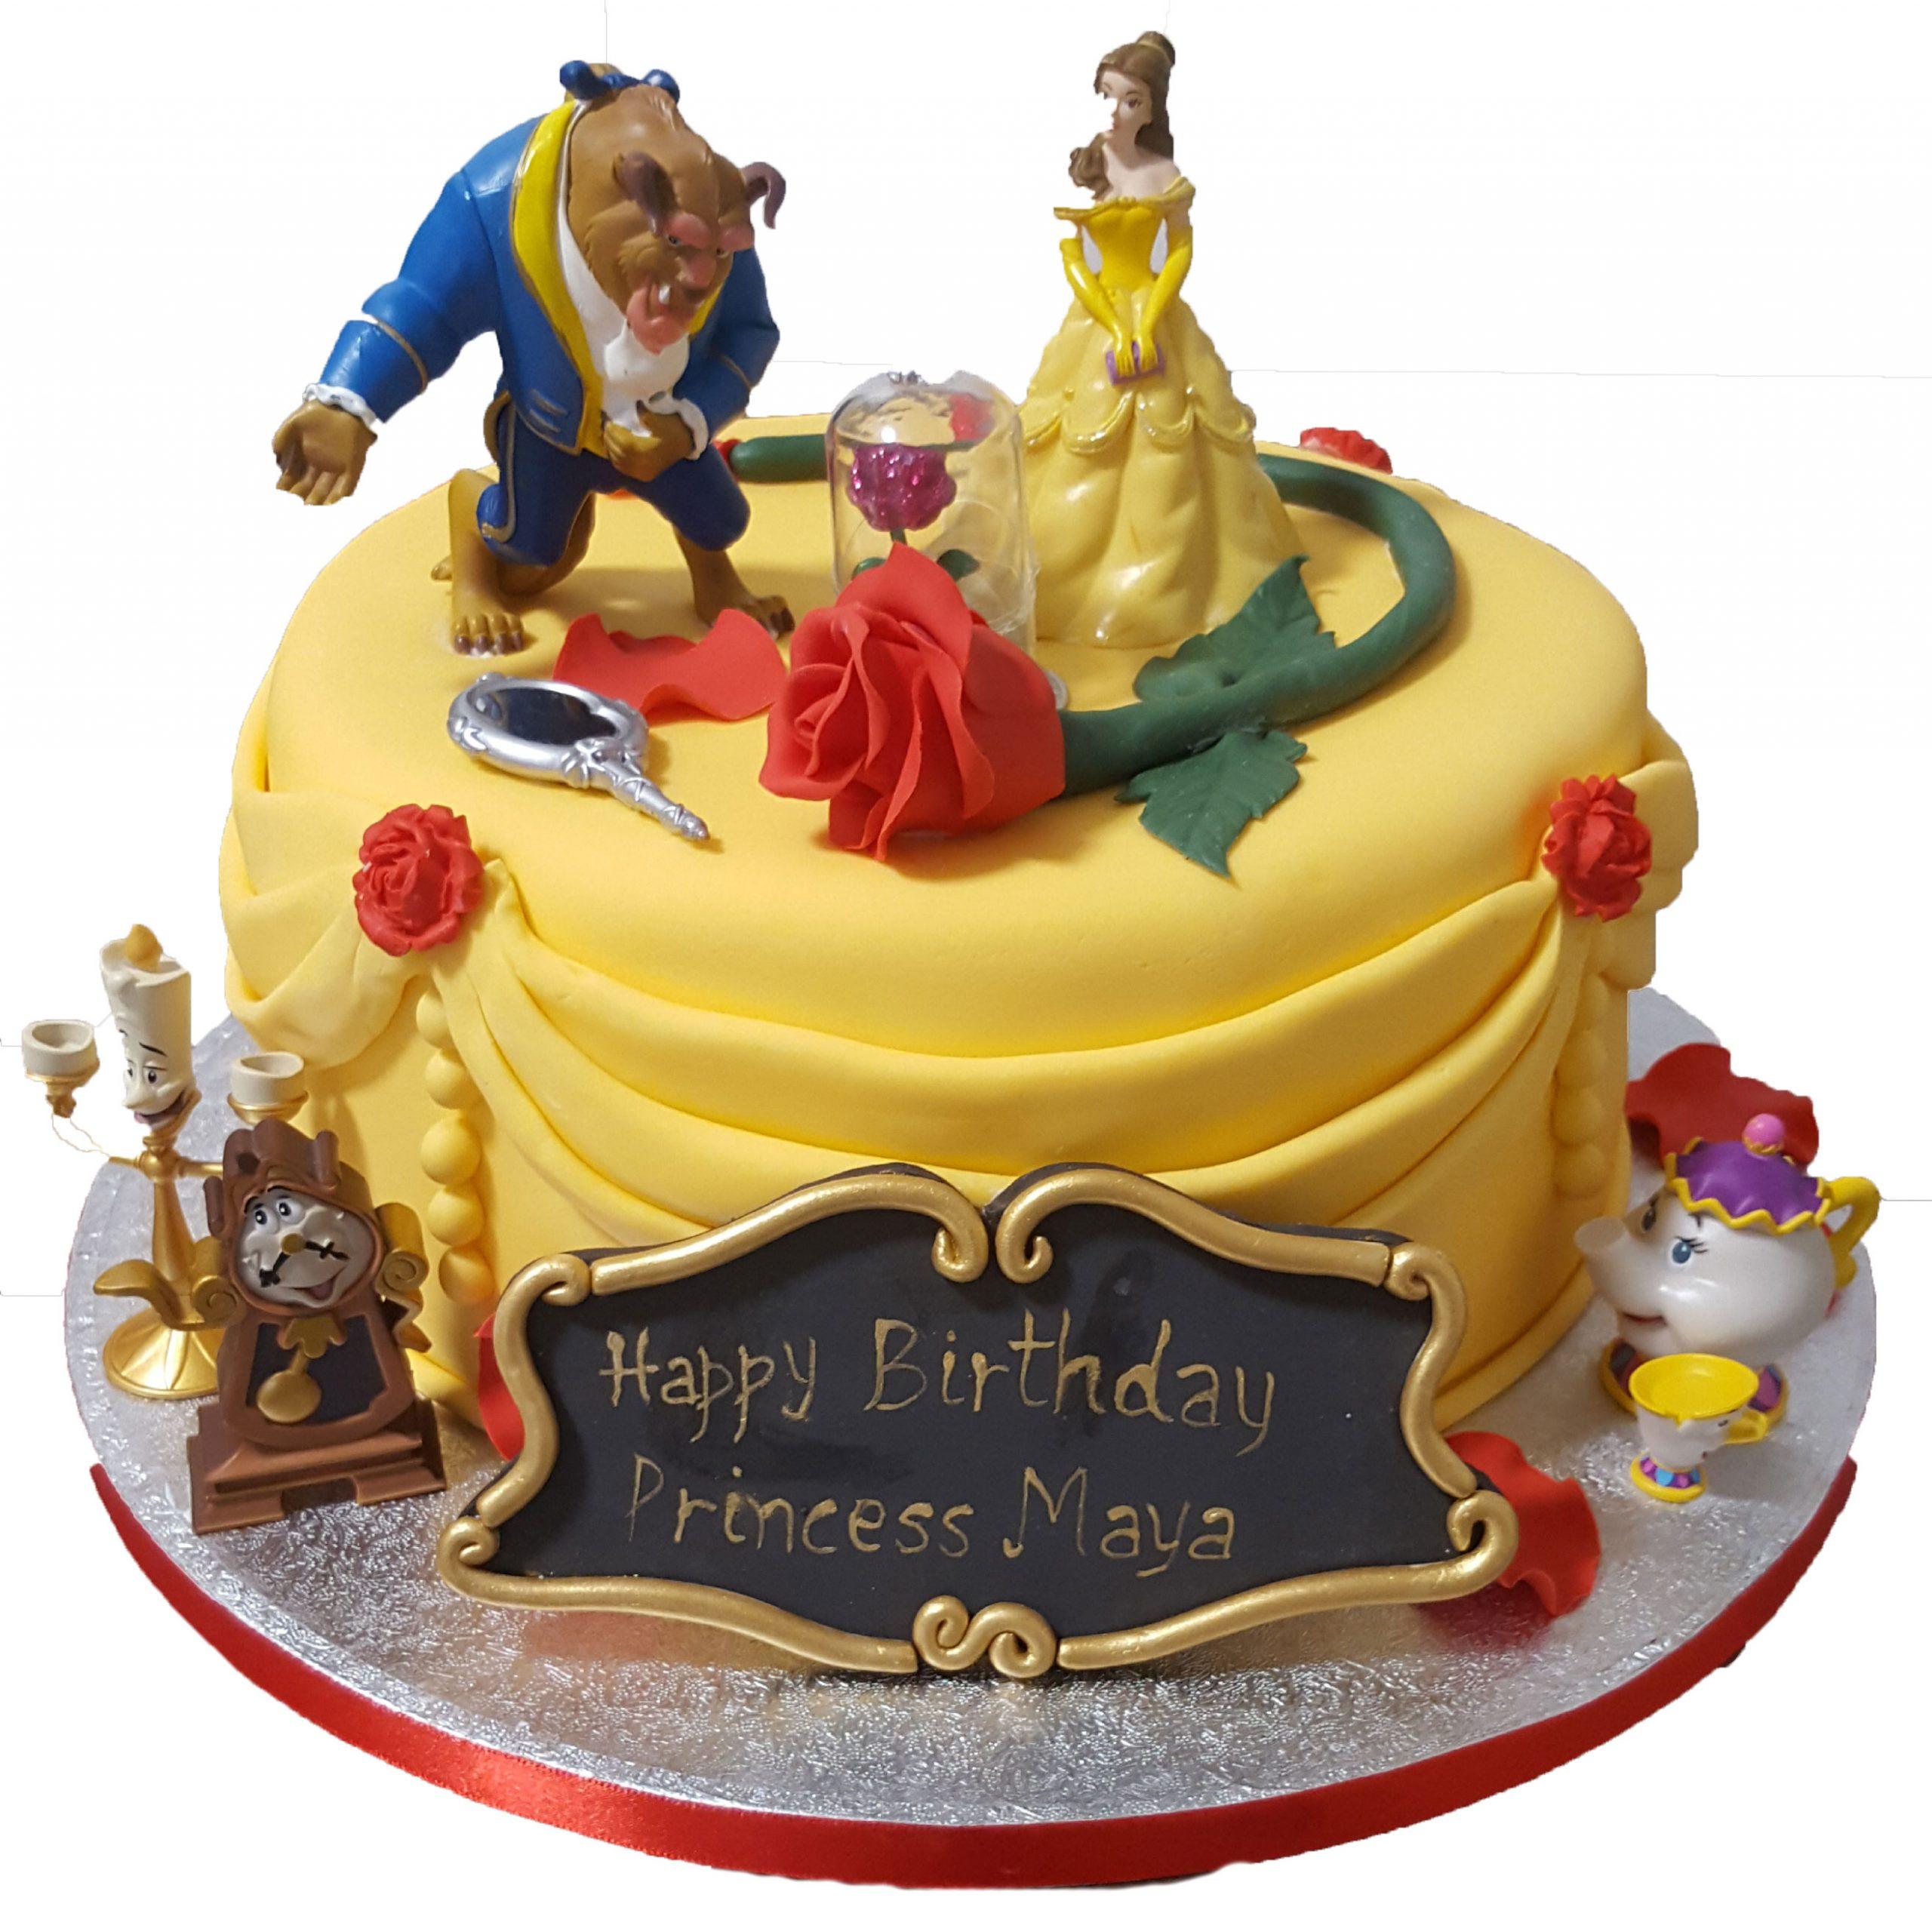 Superb Cake Boutique Beauty And The Beast Birthday Cake Cb Nc114 Cake Funny Birthday Cards Online Elaedamsfinfo